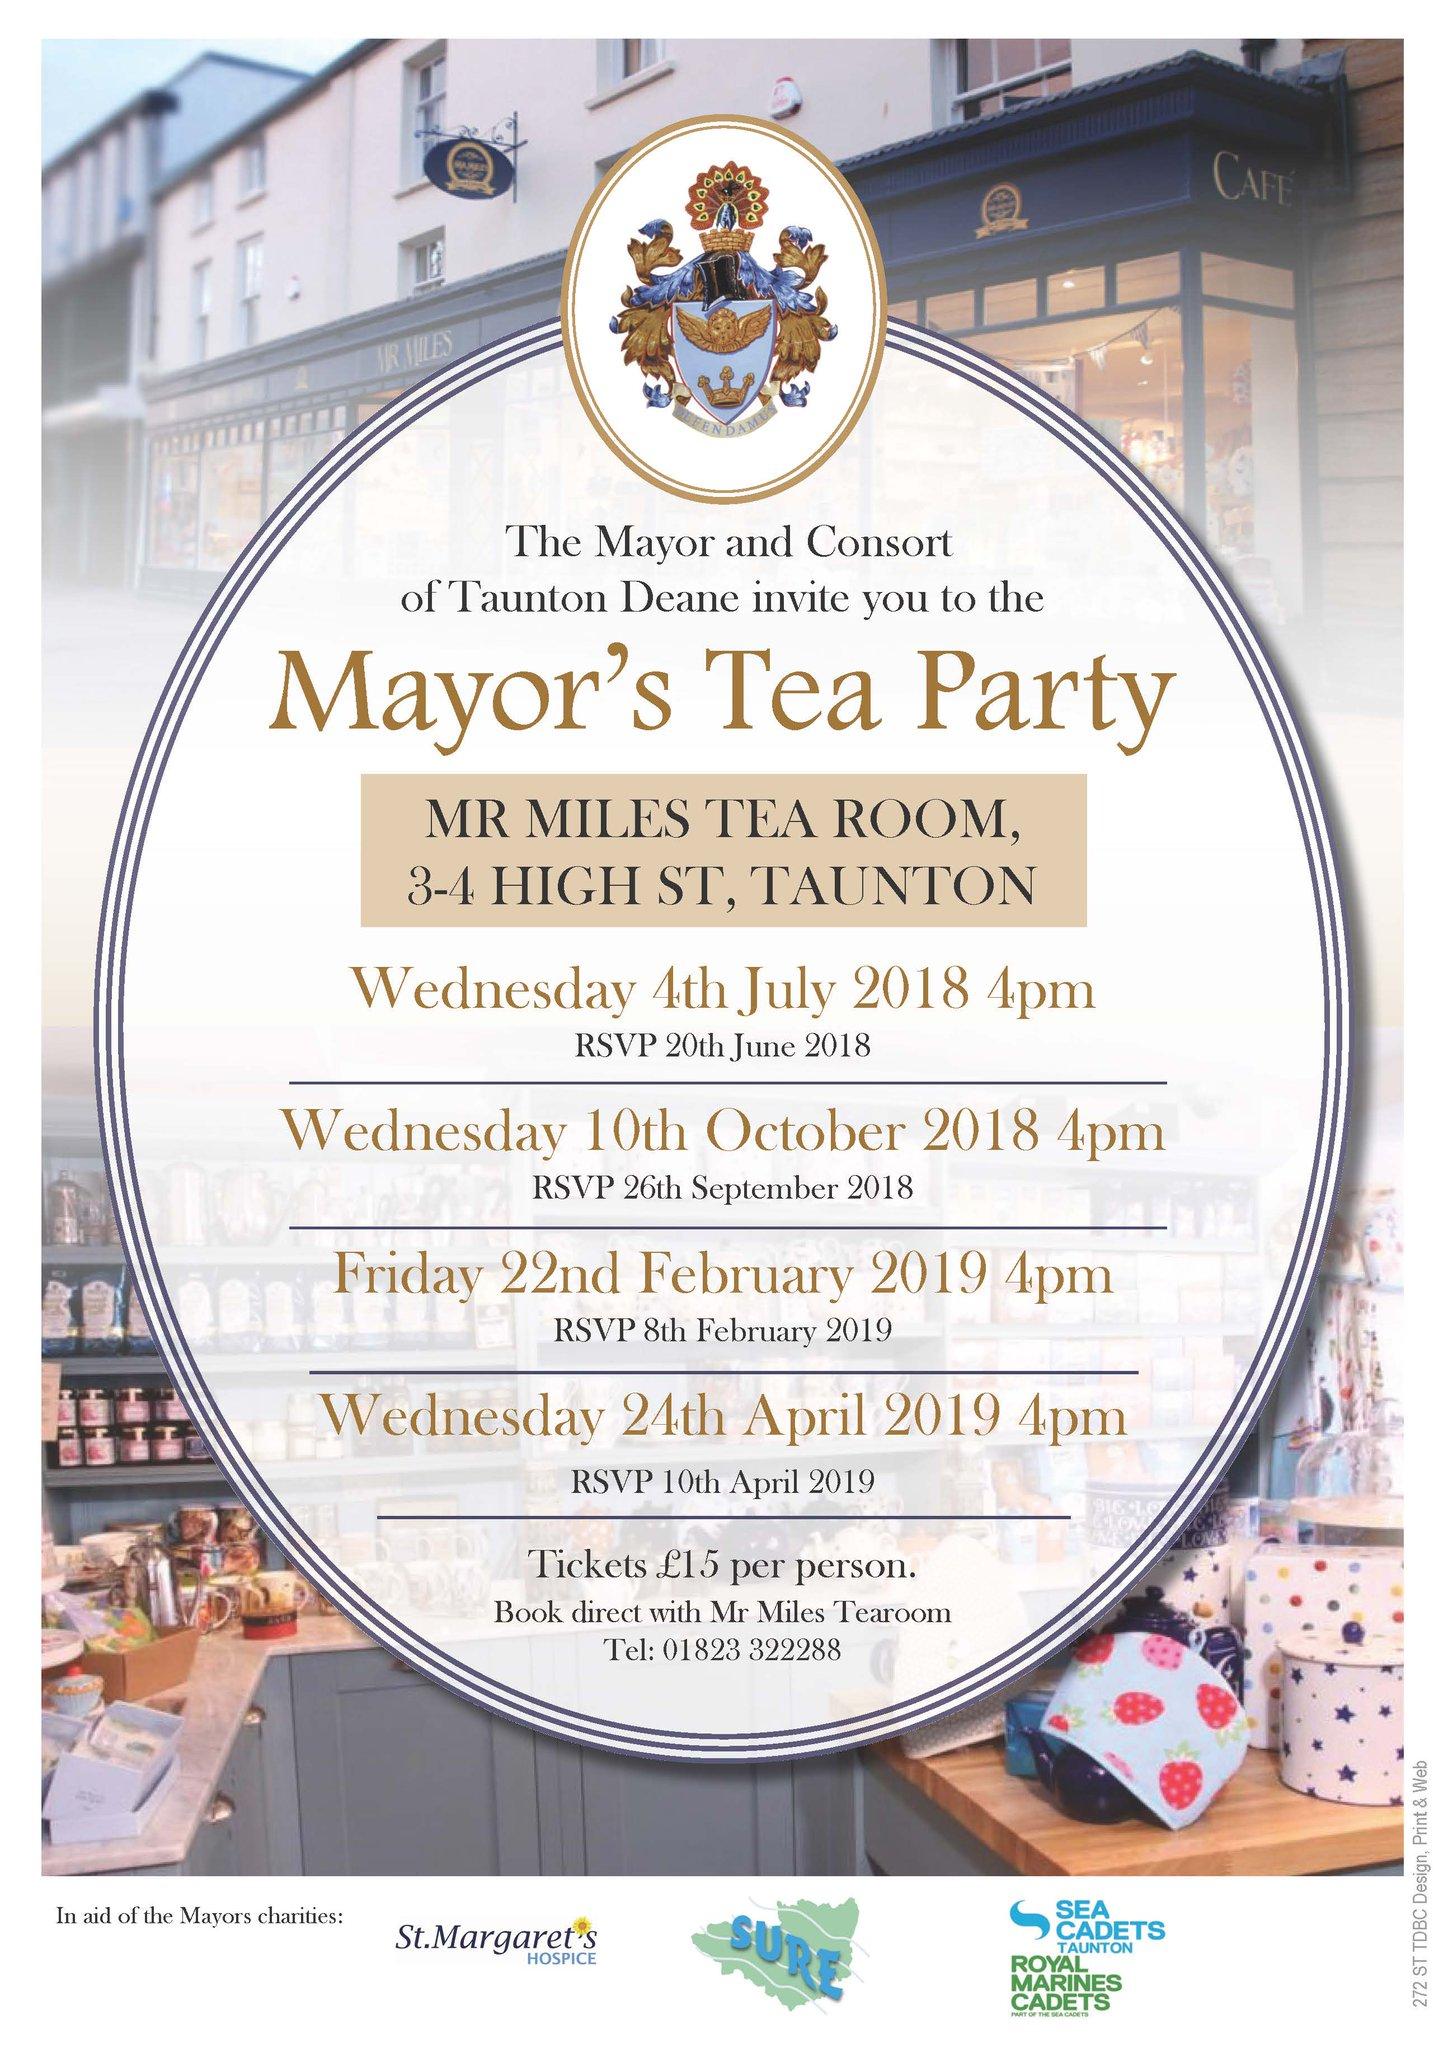 Mayor of Taunton Deane's Tea Party @ Mr Miles Tea Room